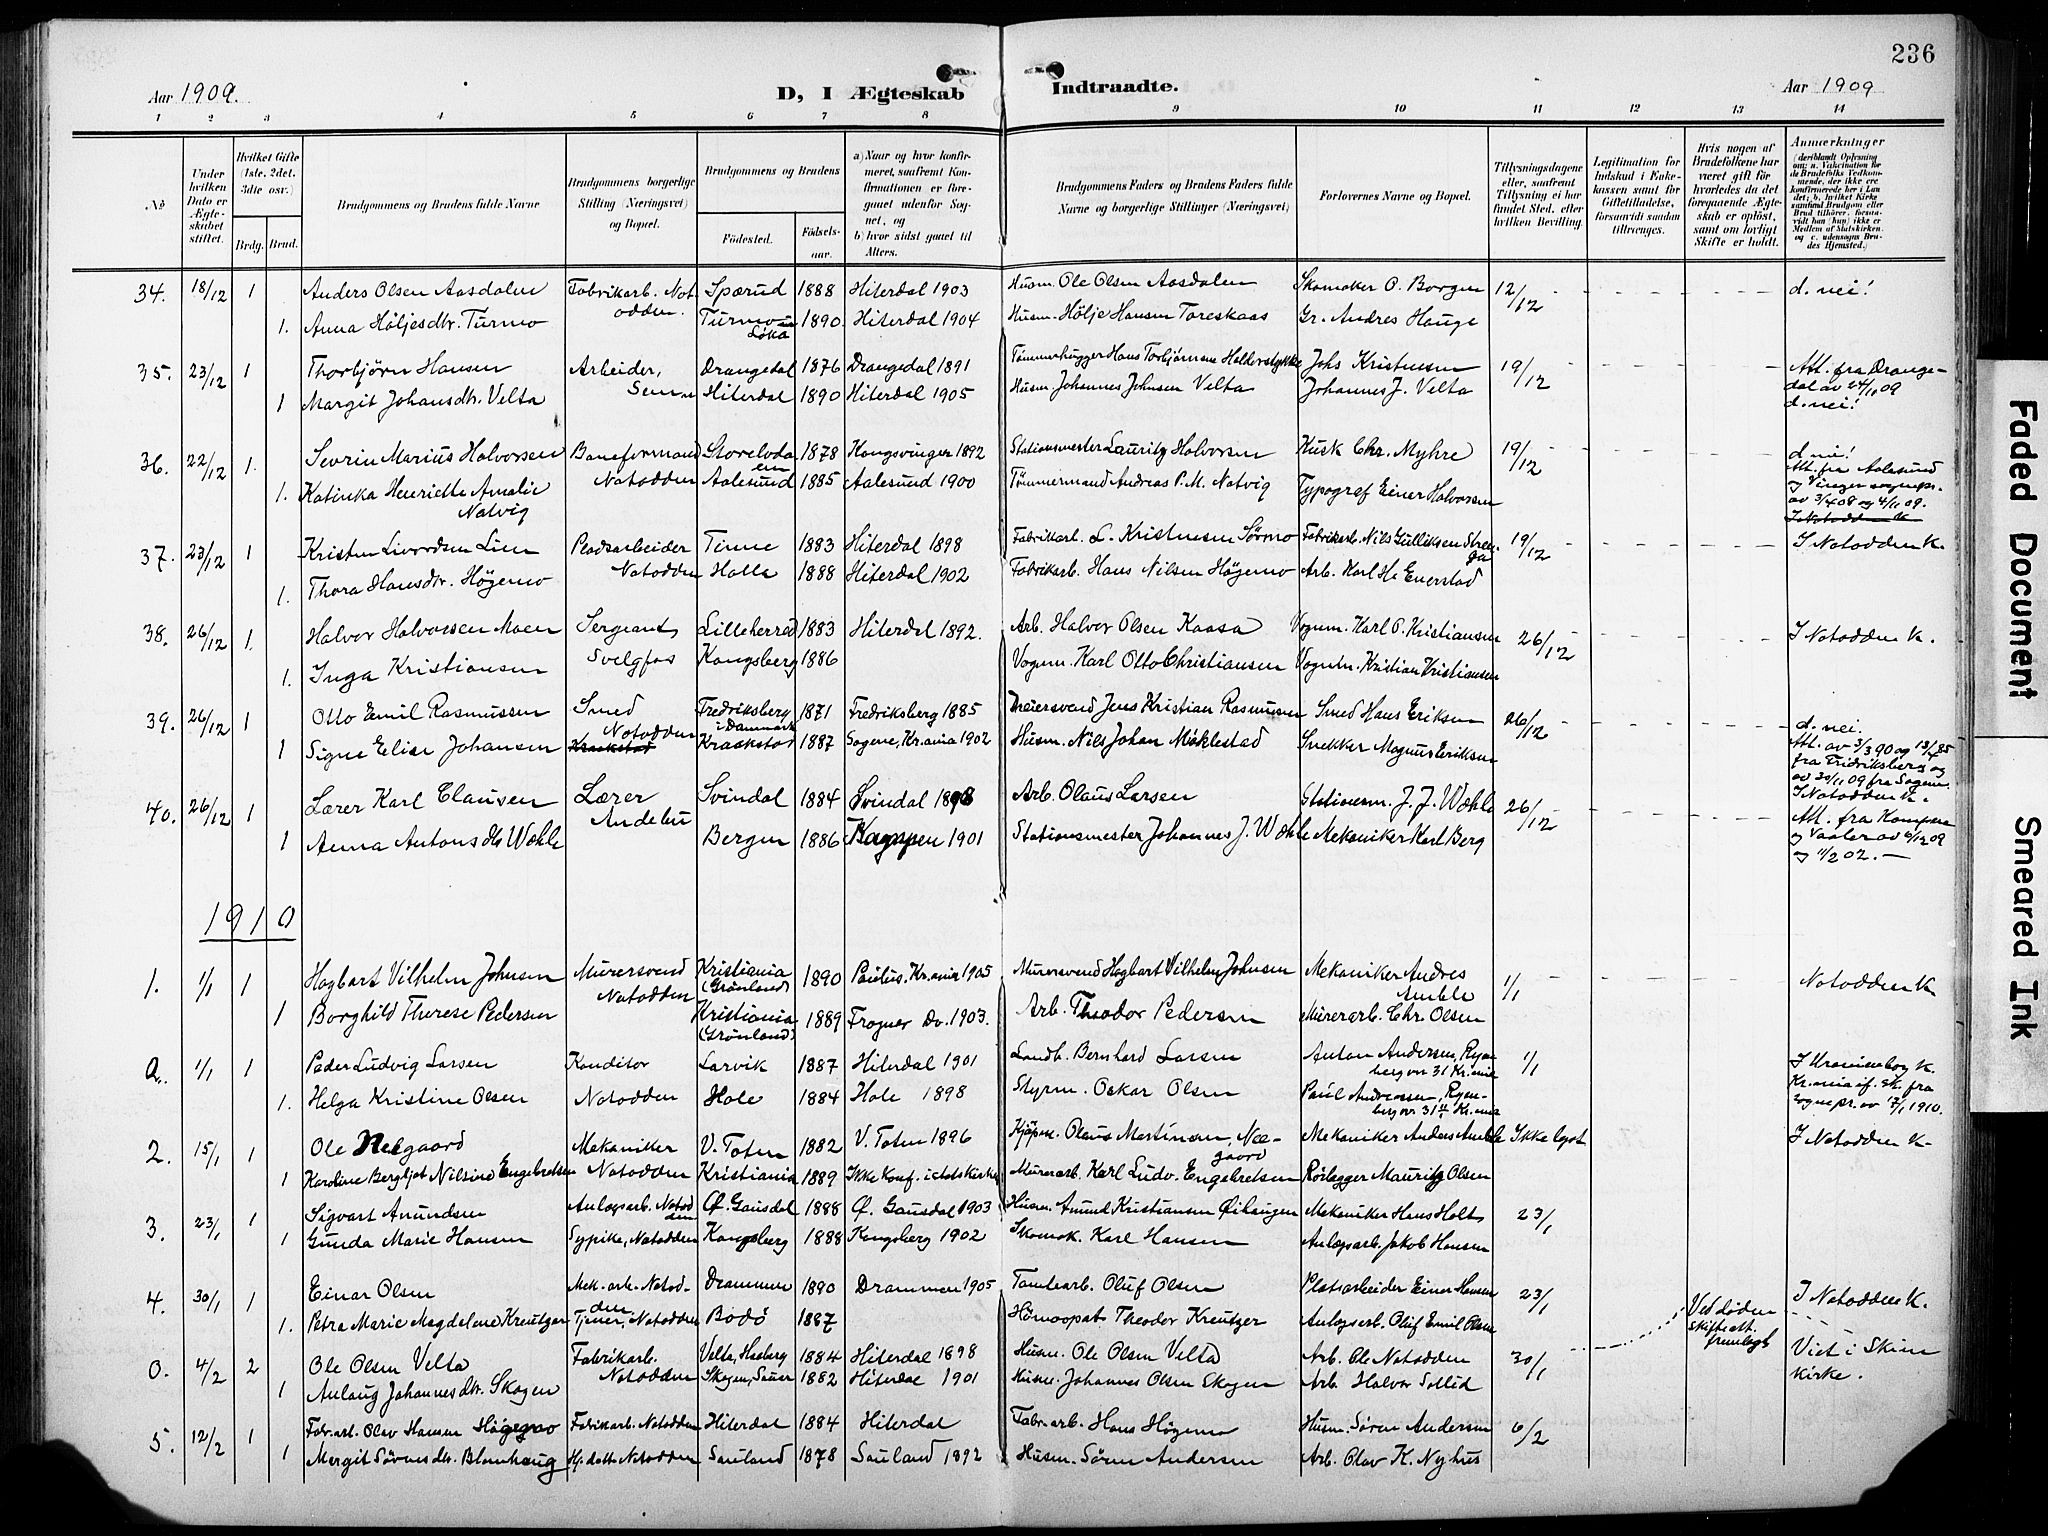 SAKO, Heddal kirkebøker, G/Ga/L0003: Klokkerbok nr. I 3, 1908-1932, s. 236